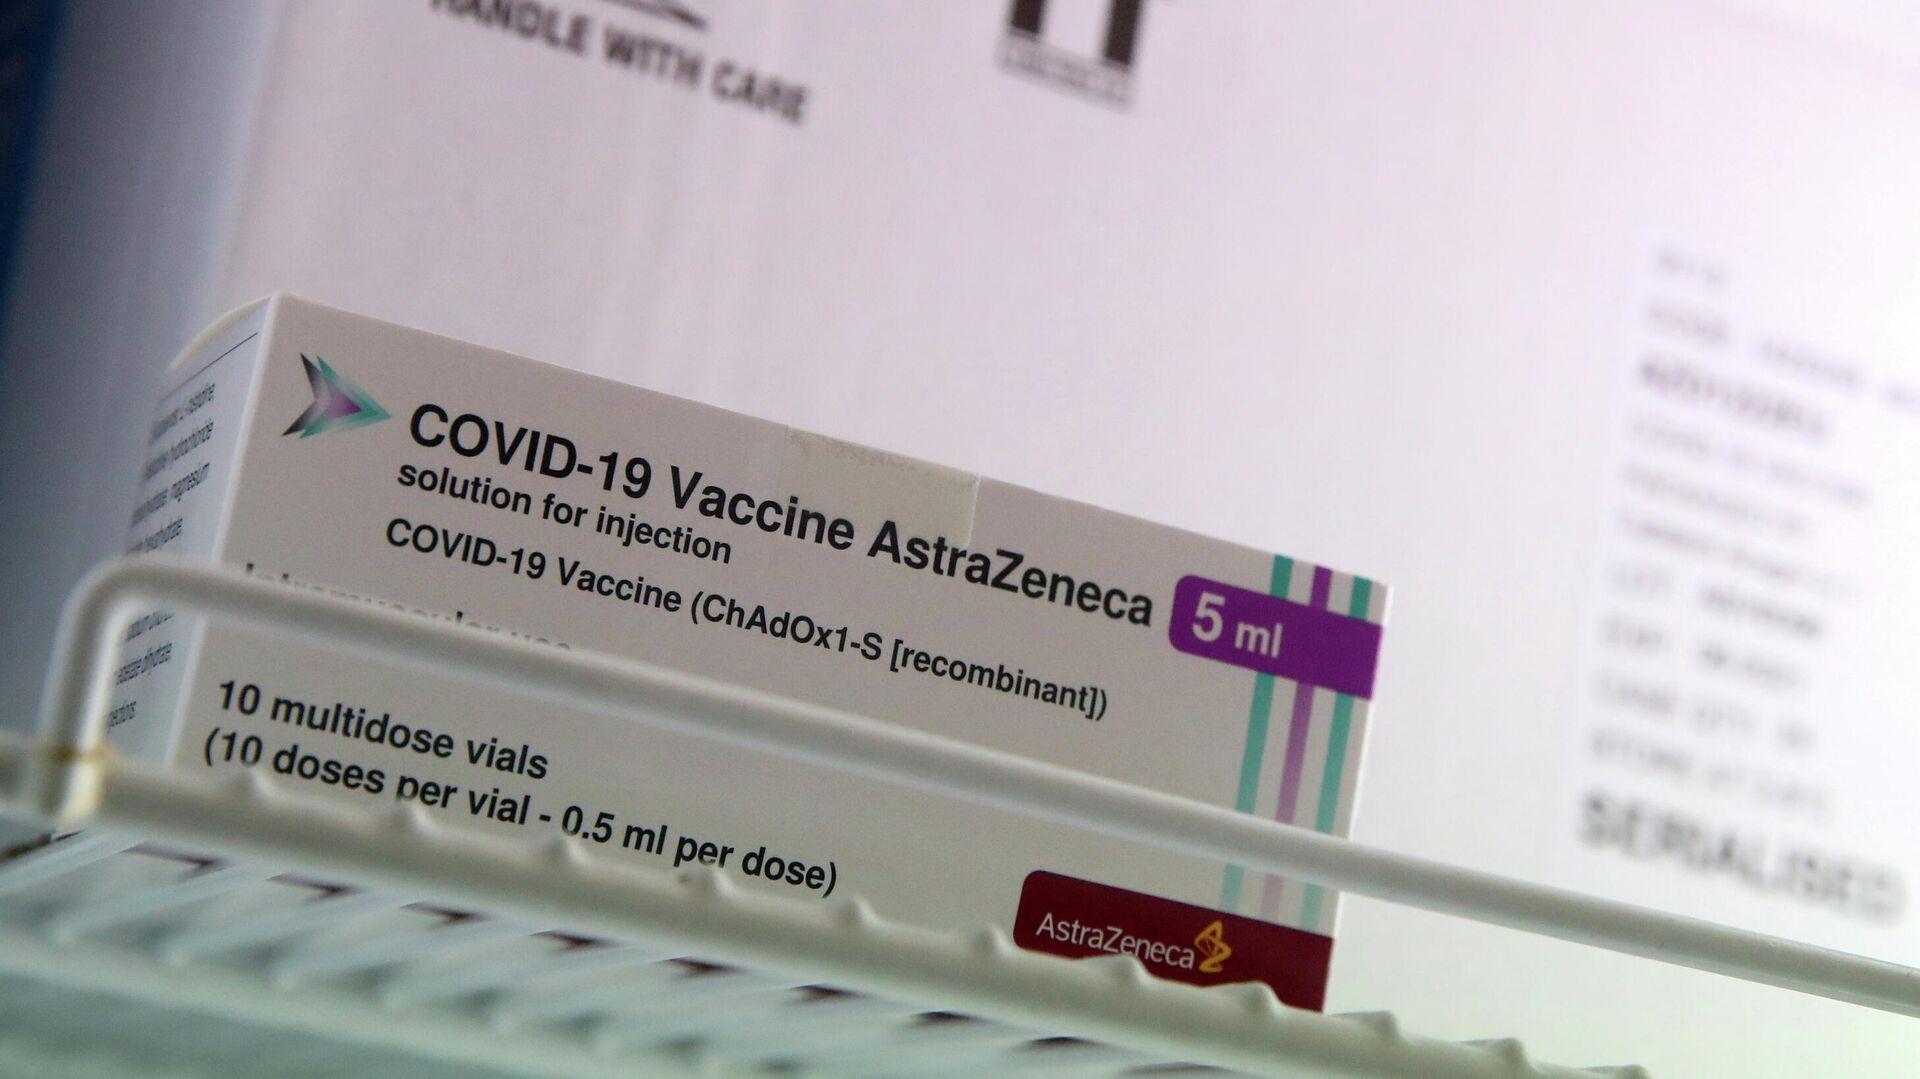 Vacuna anti-COVID de AstraZeneca - Sputnik Mundo, 1920, 11.04.2021